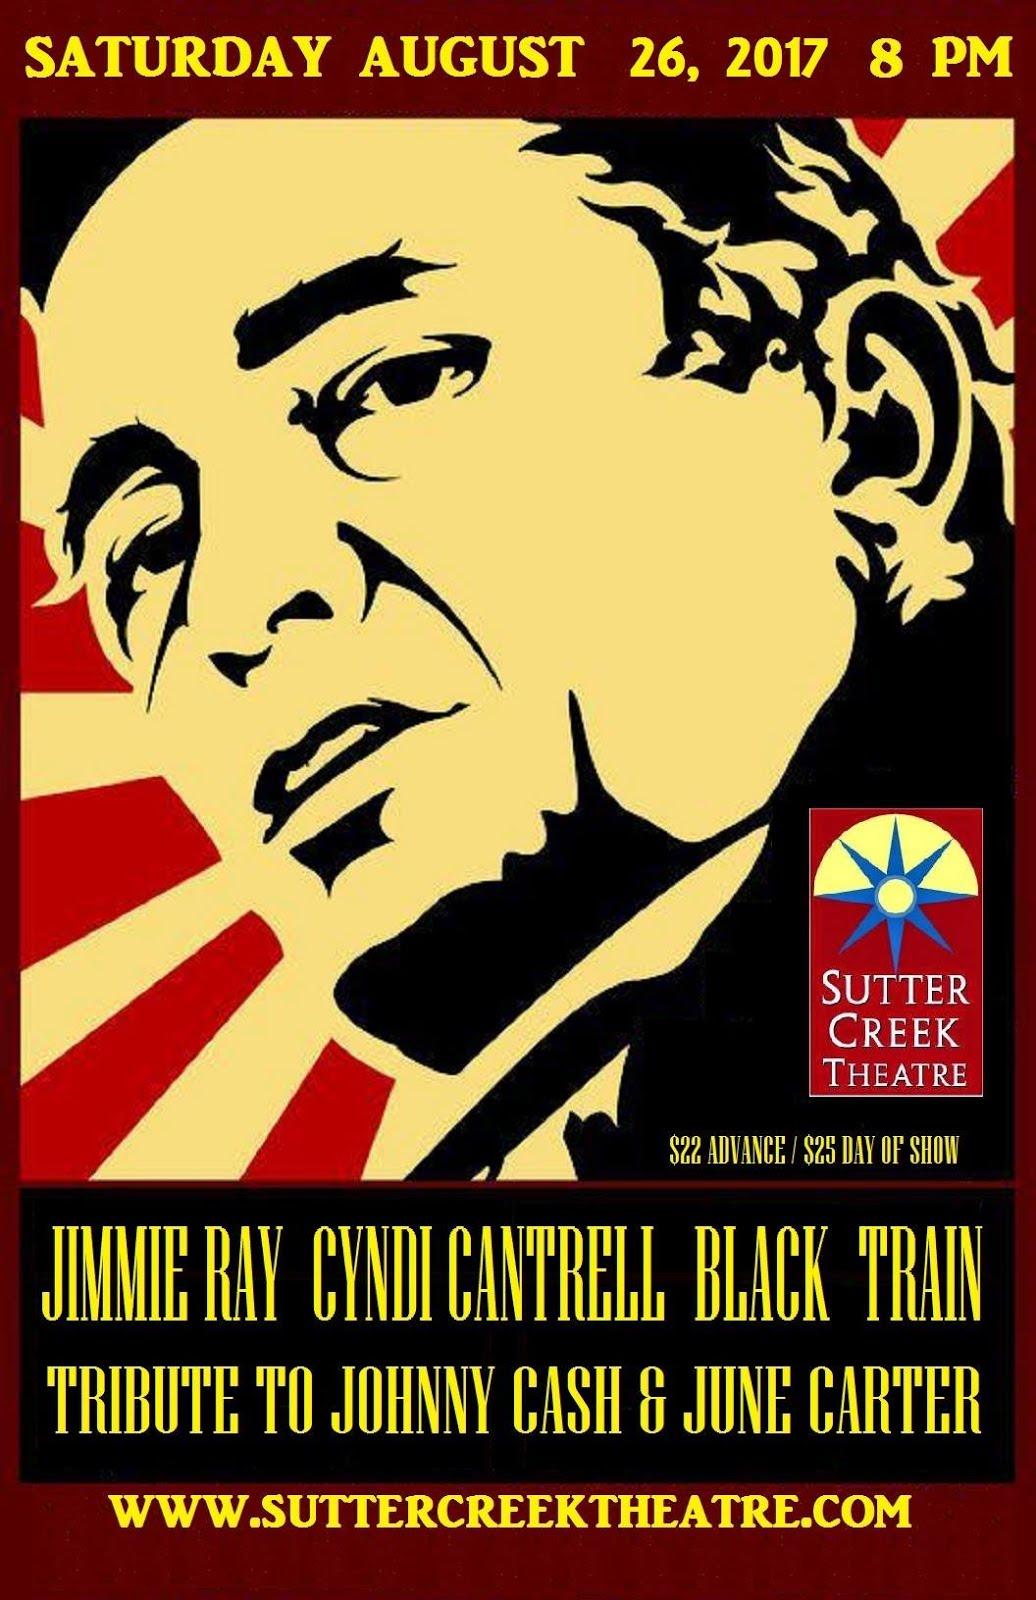 Black Train: Tribute to Johnny Cash & June Carter - Sat Aug 26